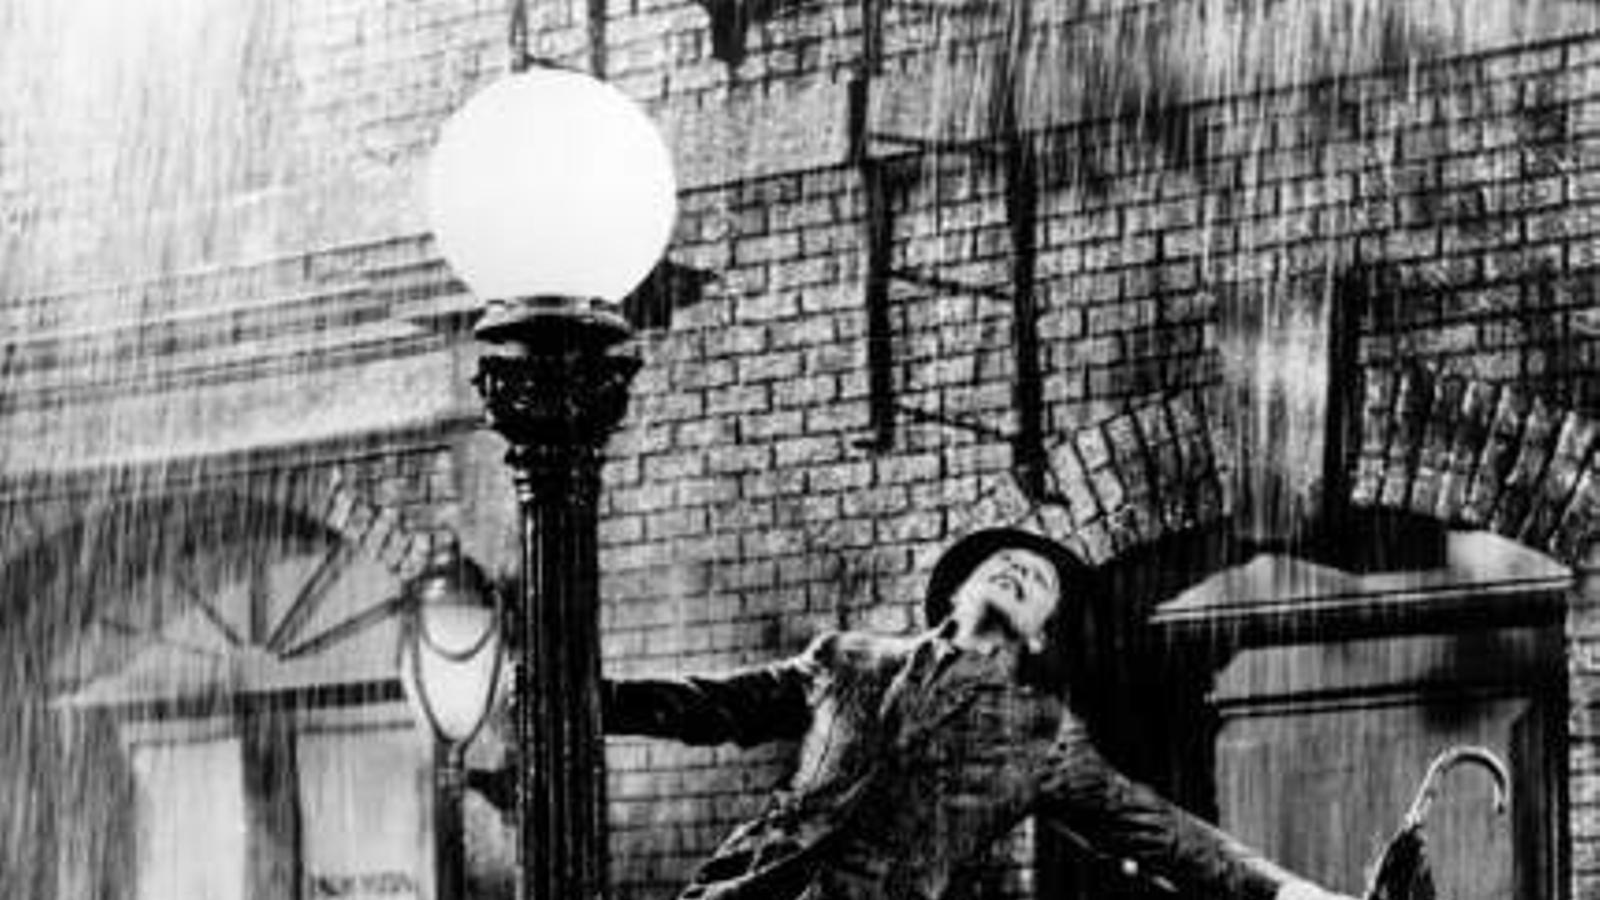 Miquel iceta Don Lockwood 'cantant sota la pluja'